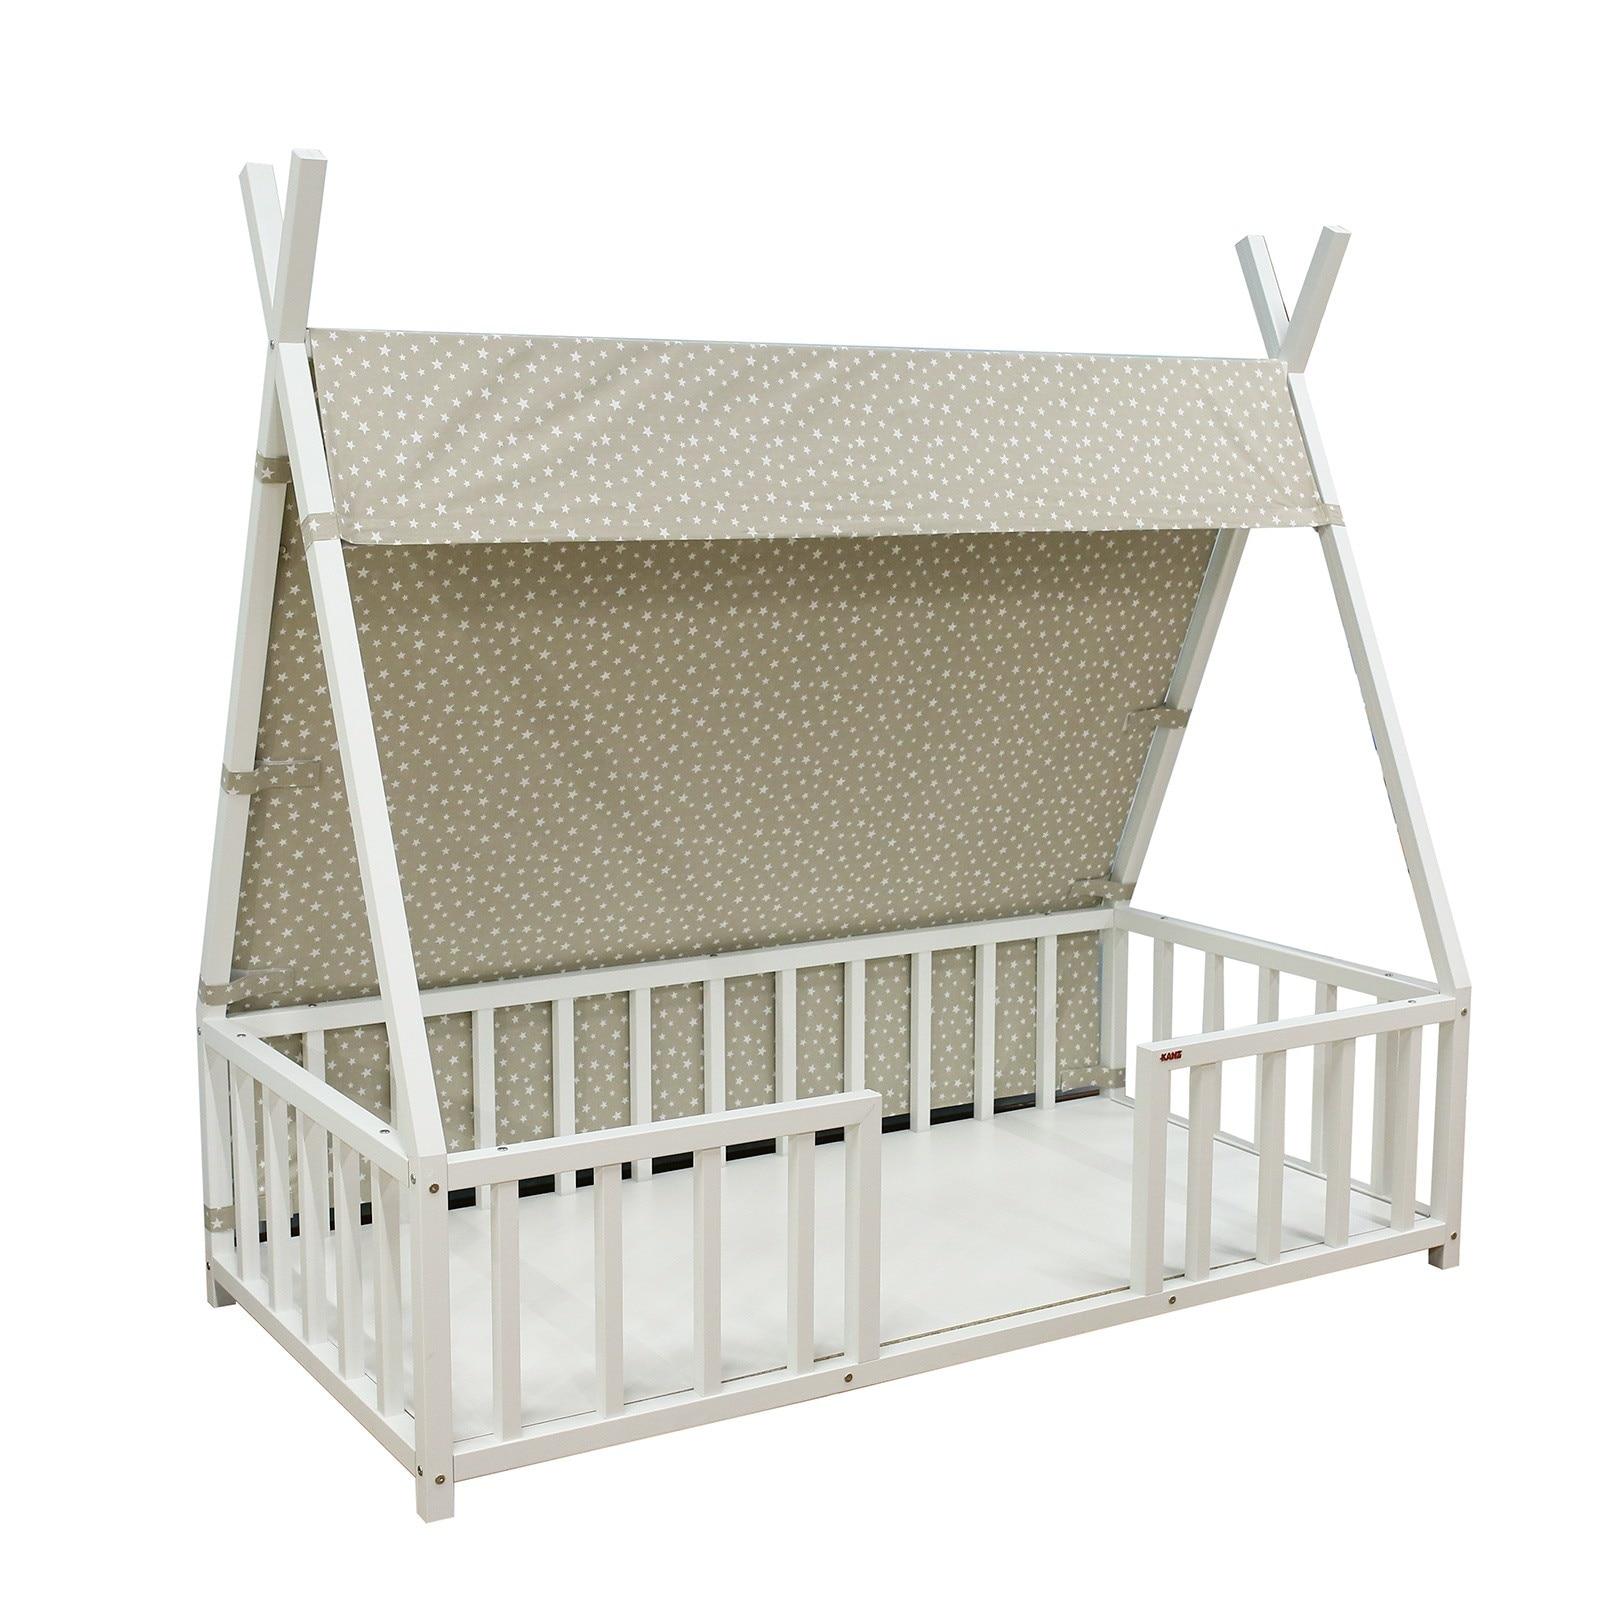 Ebebek Baby Plus Star Baby Cradle Canvas/Tent